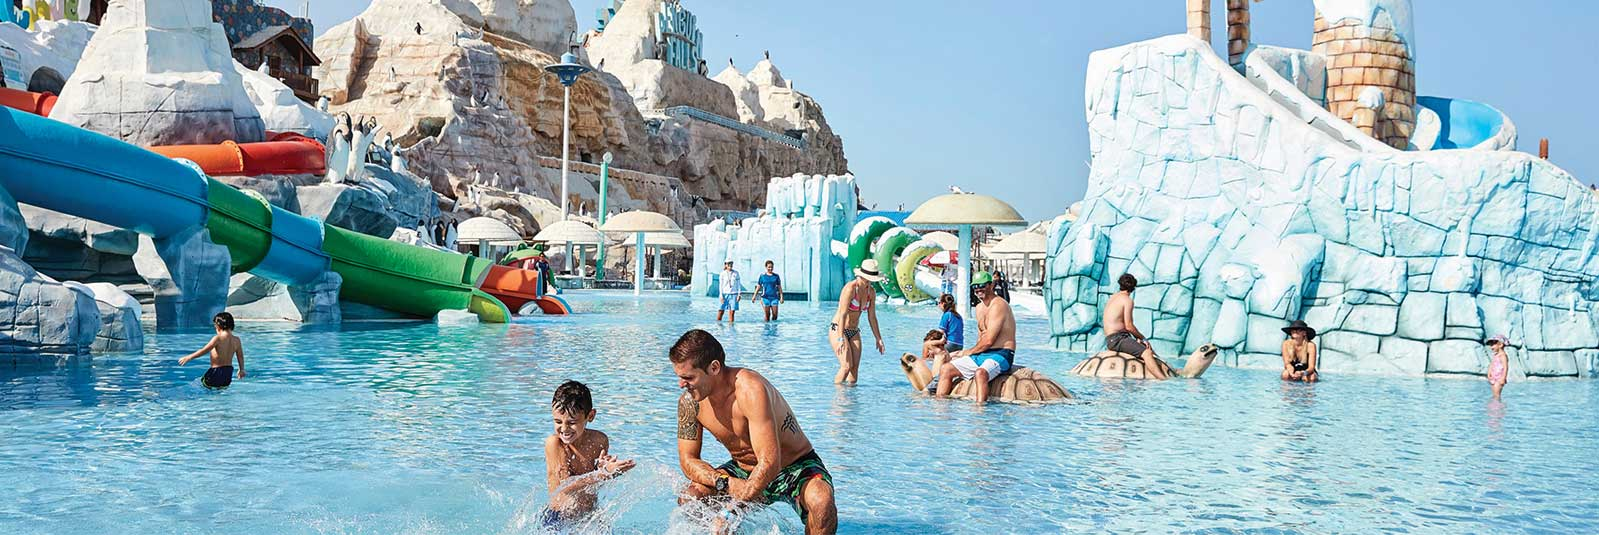 iceland-waterpark-dubai